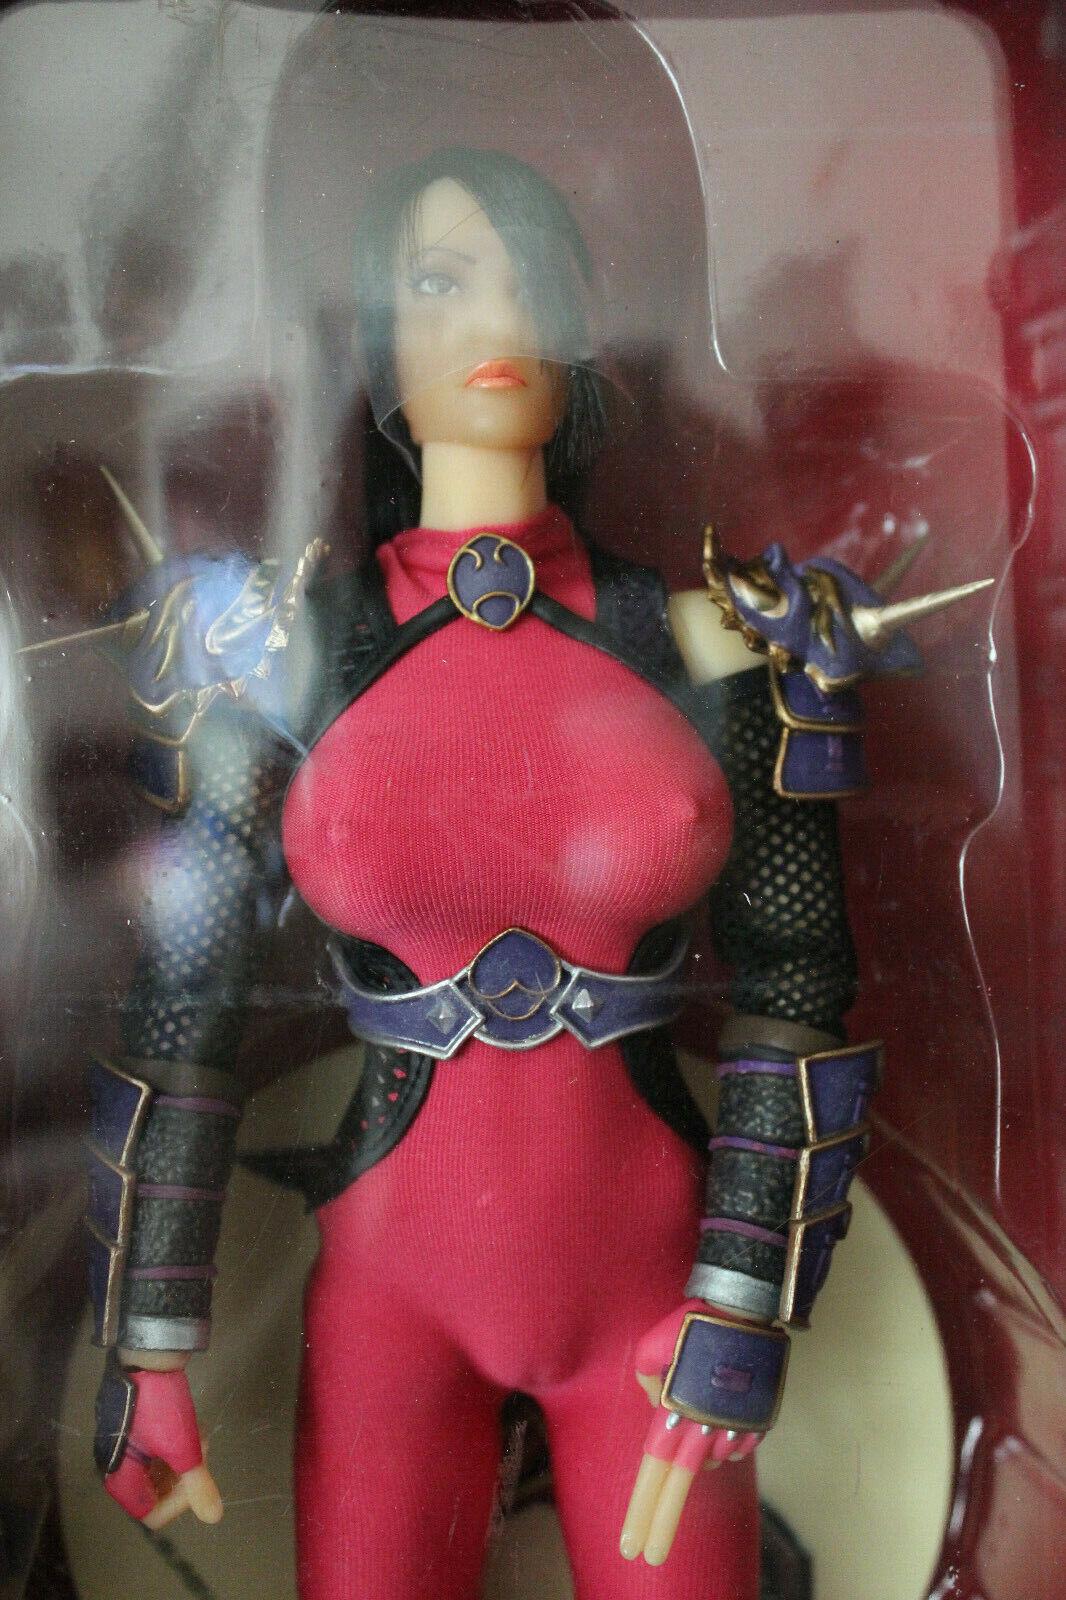 TRIAD giocattoli  OTAKU  PHICEN SOUL CALIBUR IV TAKI 16 FEMALE azione cifra